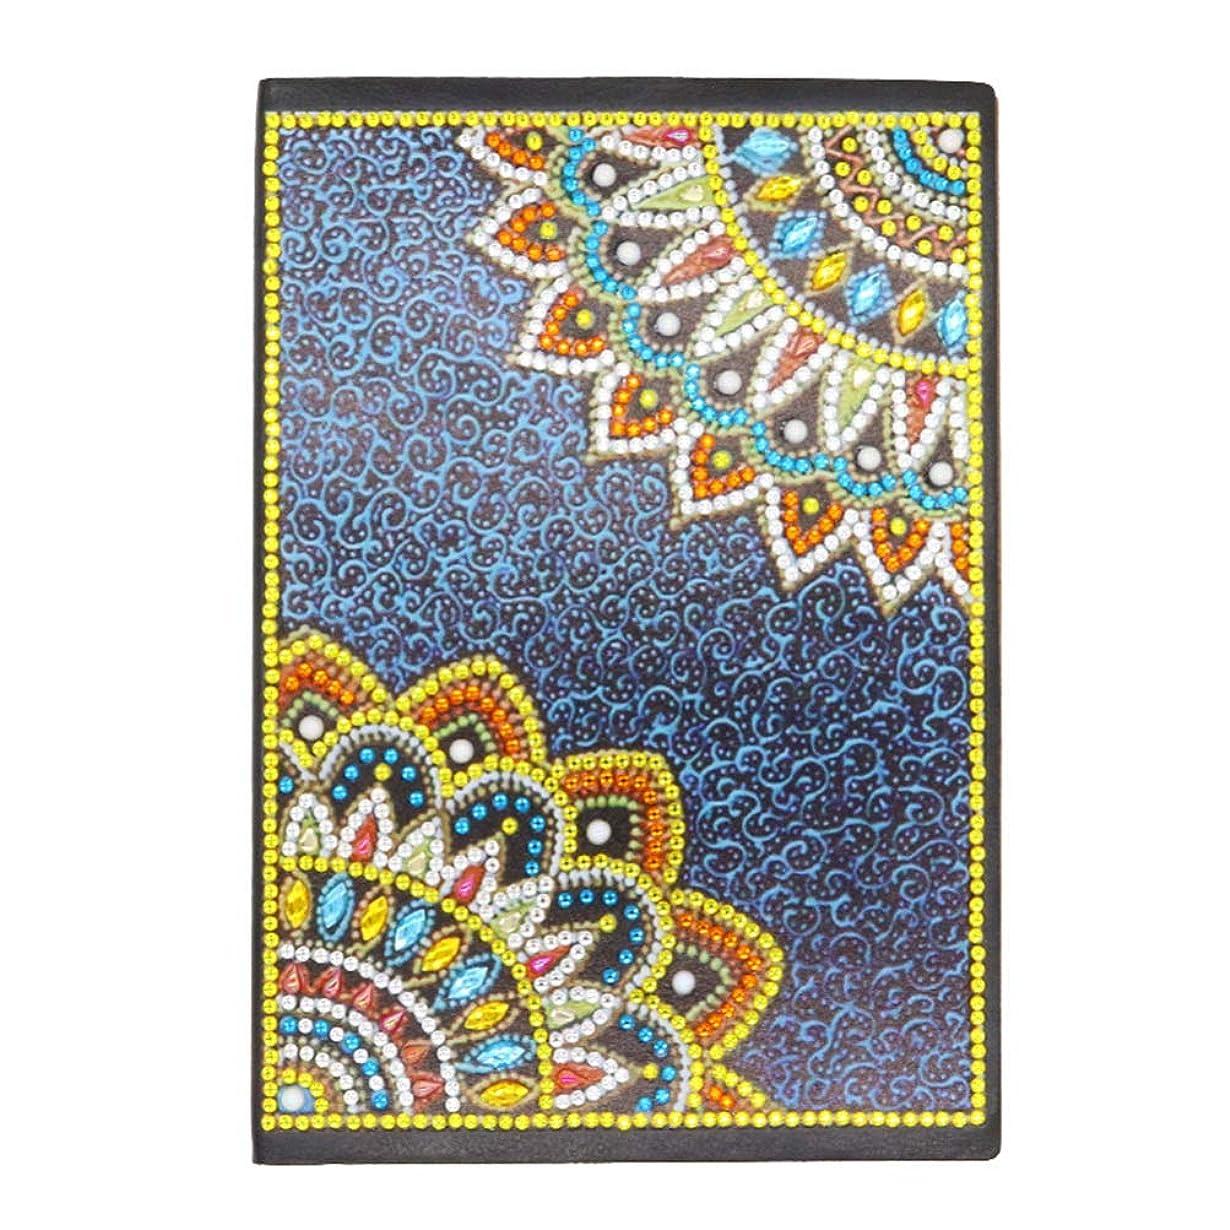 Healifty カラフルなダイヤモンド塗装ノートブックa5ライティングジャーナルノート日記ノートブック用クリスマスウェディングギフトbj011